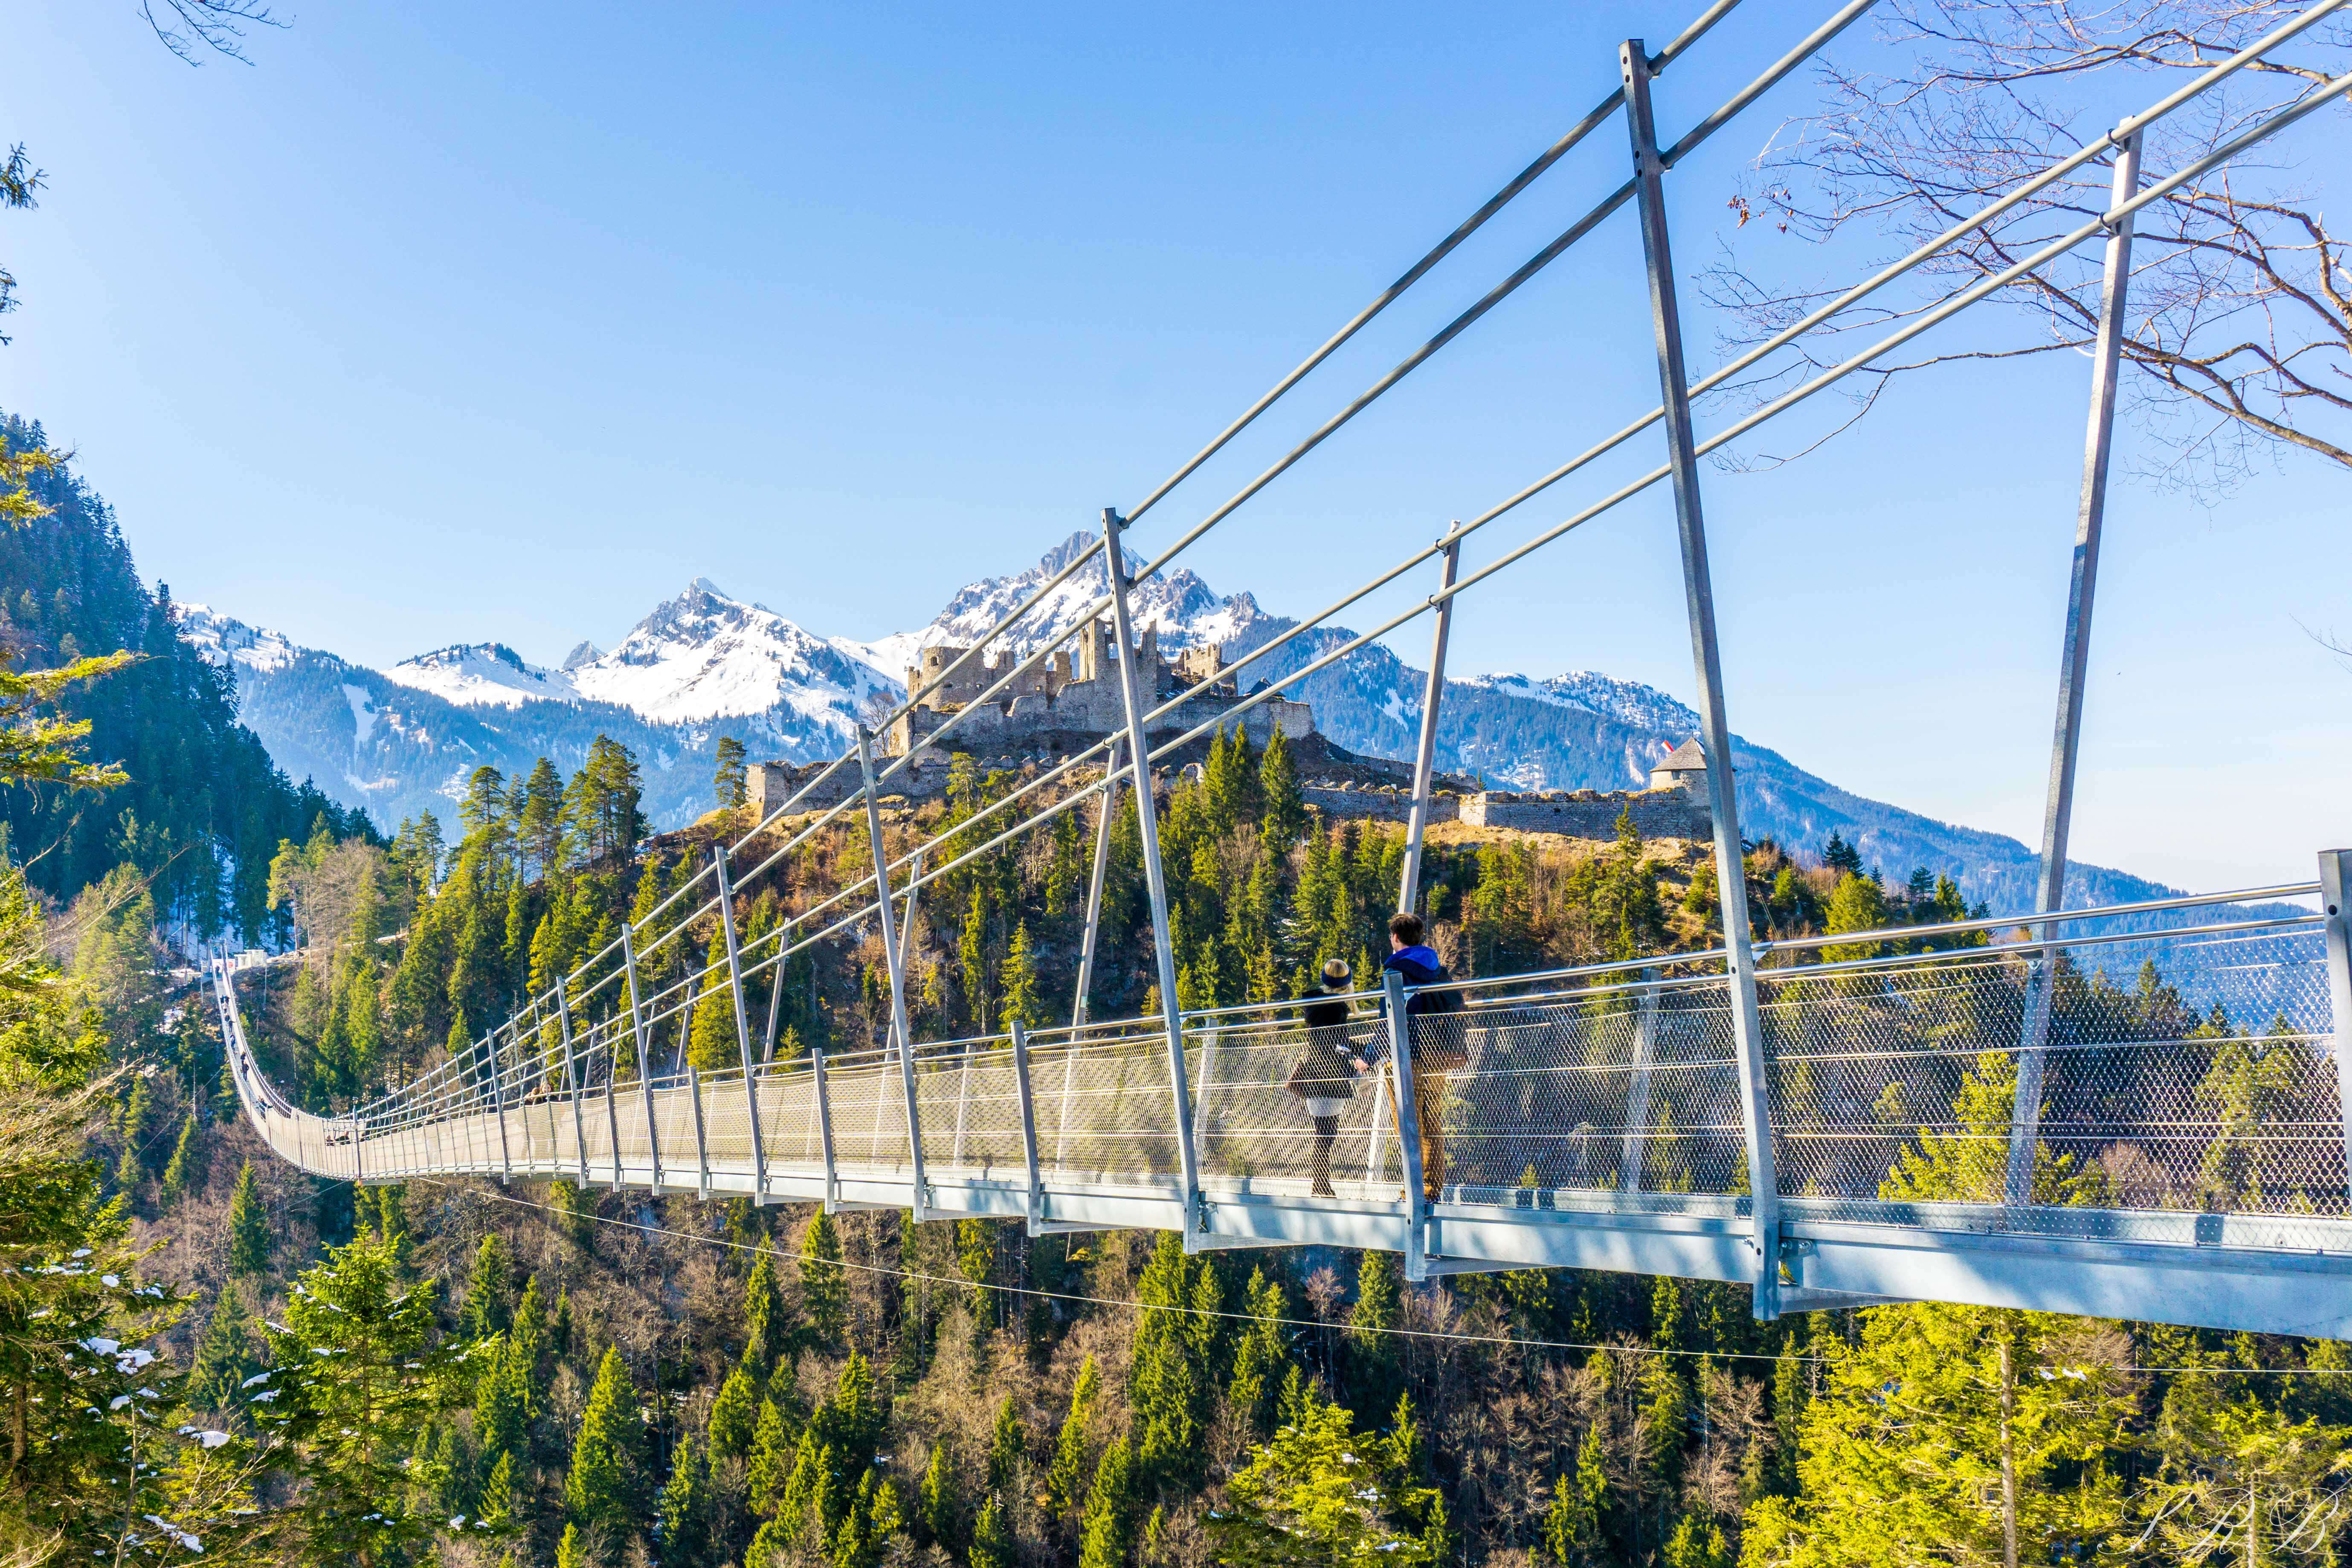 Füssen, Germany Suspension Bridges and Fairytale Castles